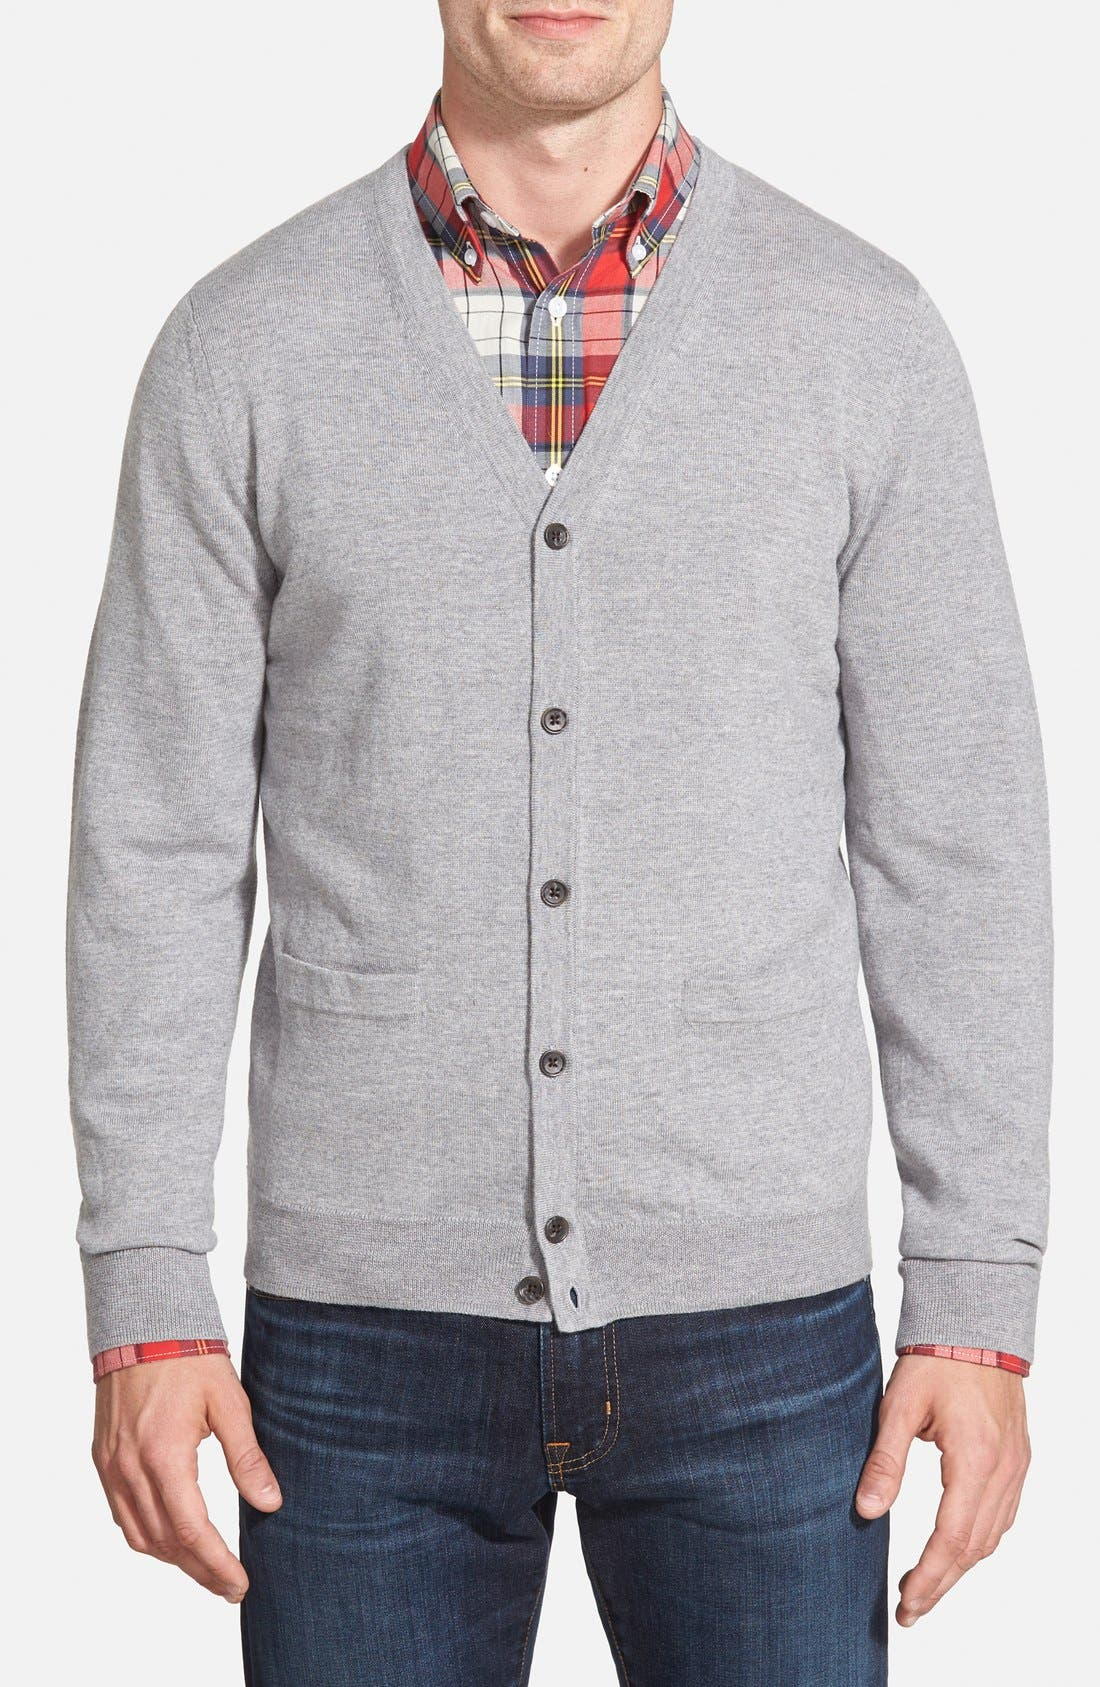 Main Image - Nordstrom Men's Shop Merino Wool Cardigan